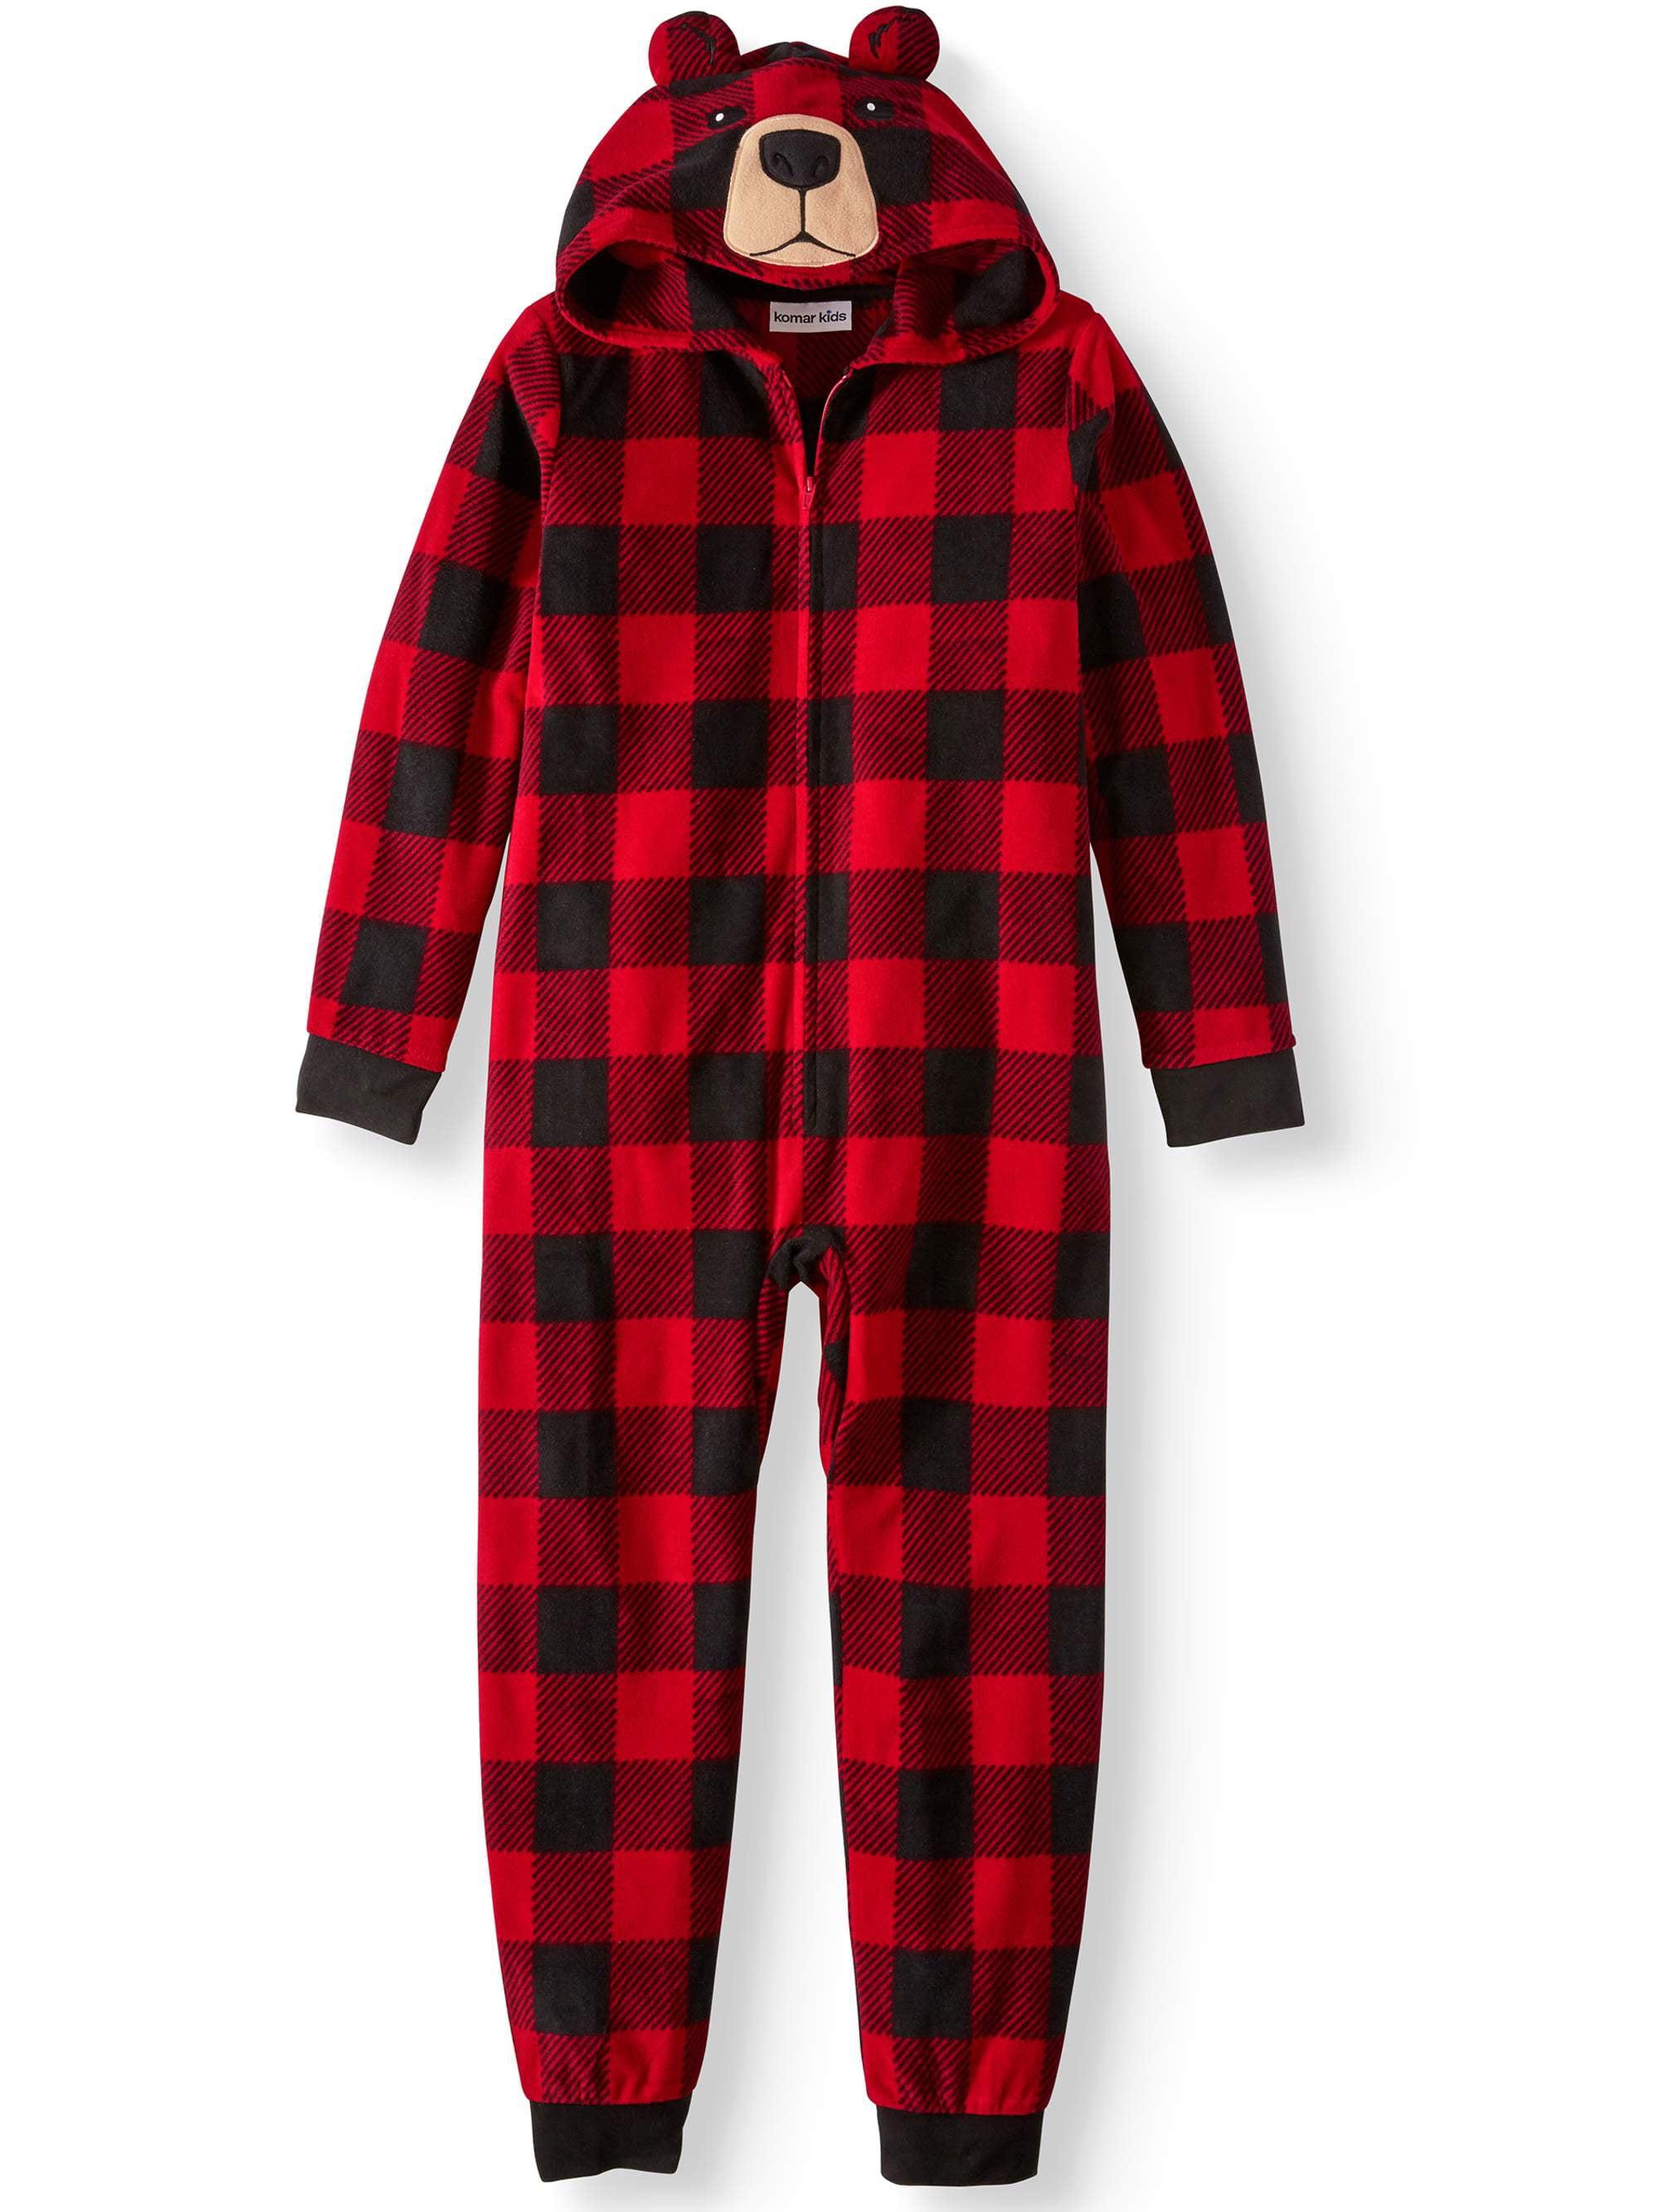 Komar Kids Boy's Buffalo Plaid Bear Hooded Pajama Sleeper (Little Boys & Big Boys)